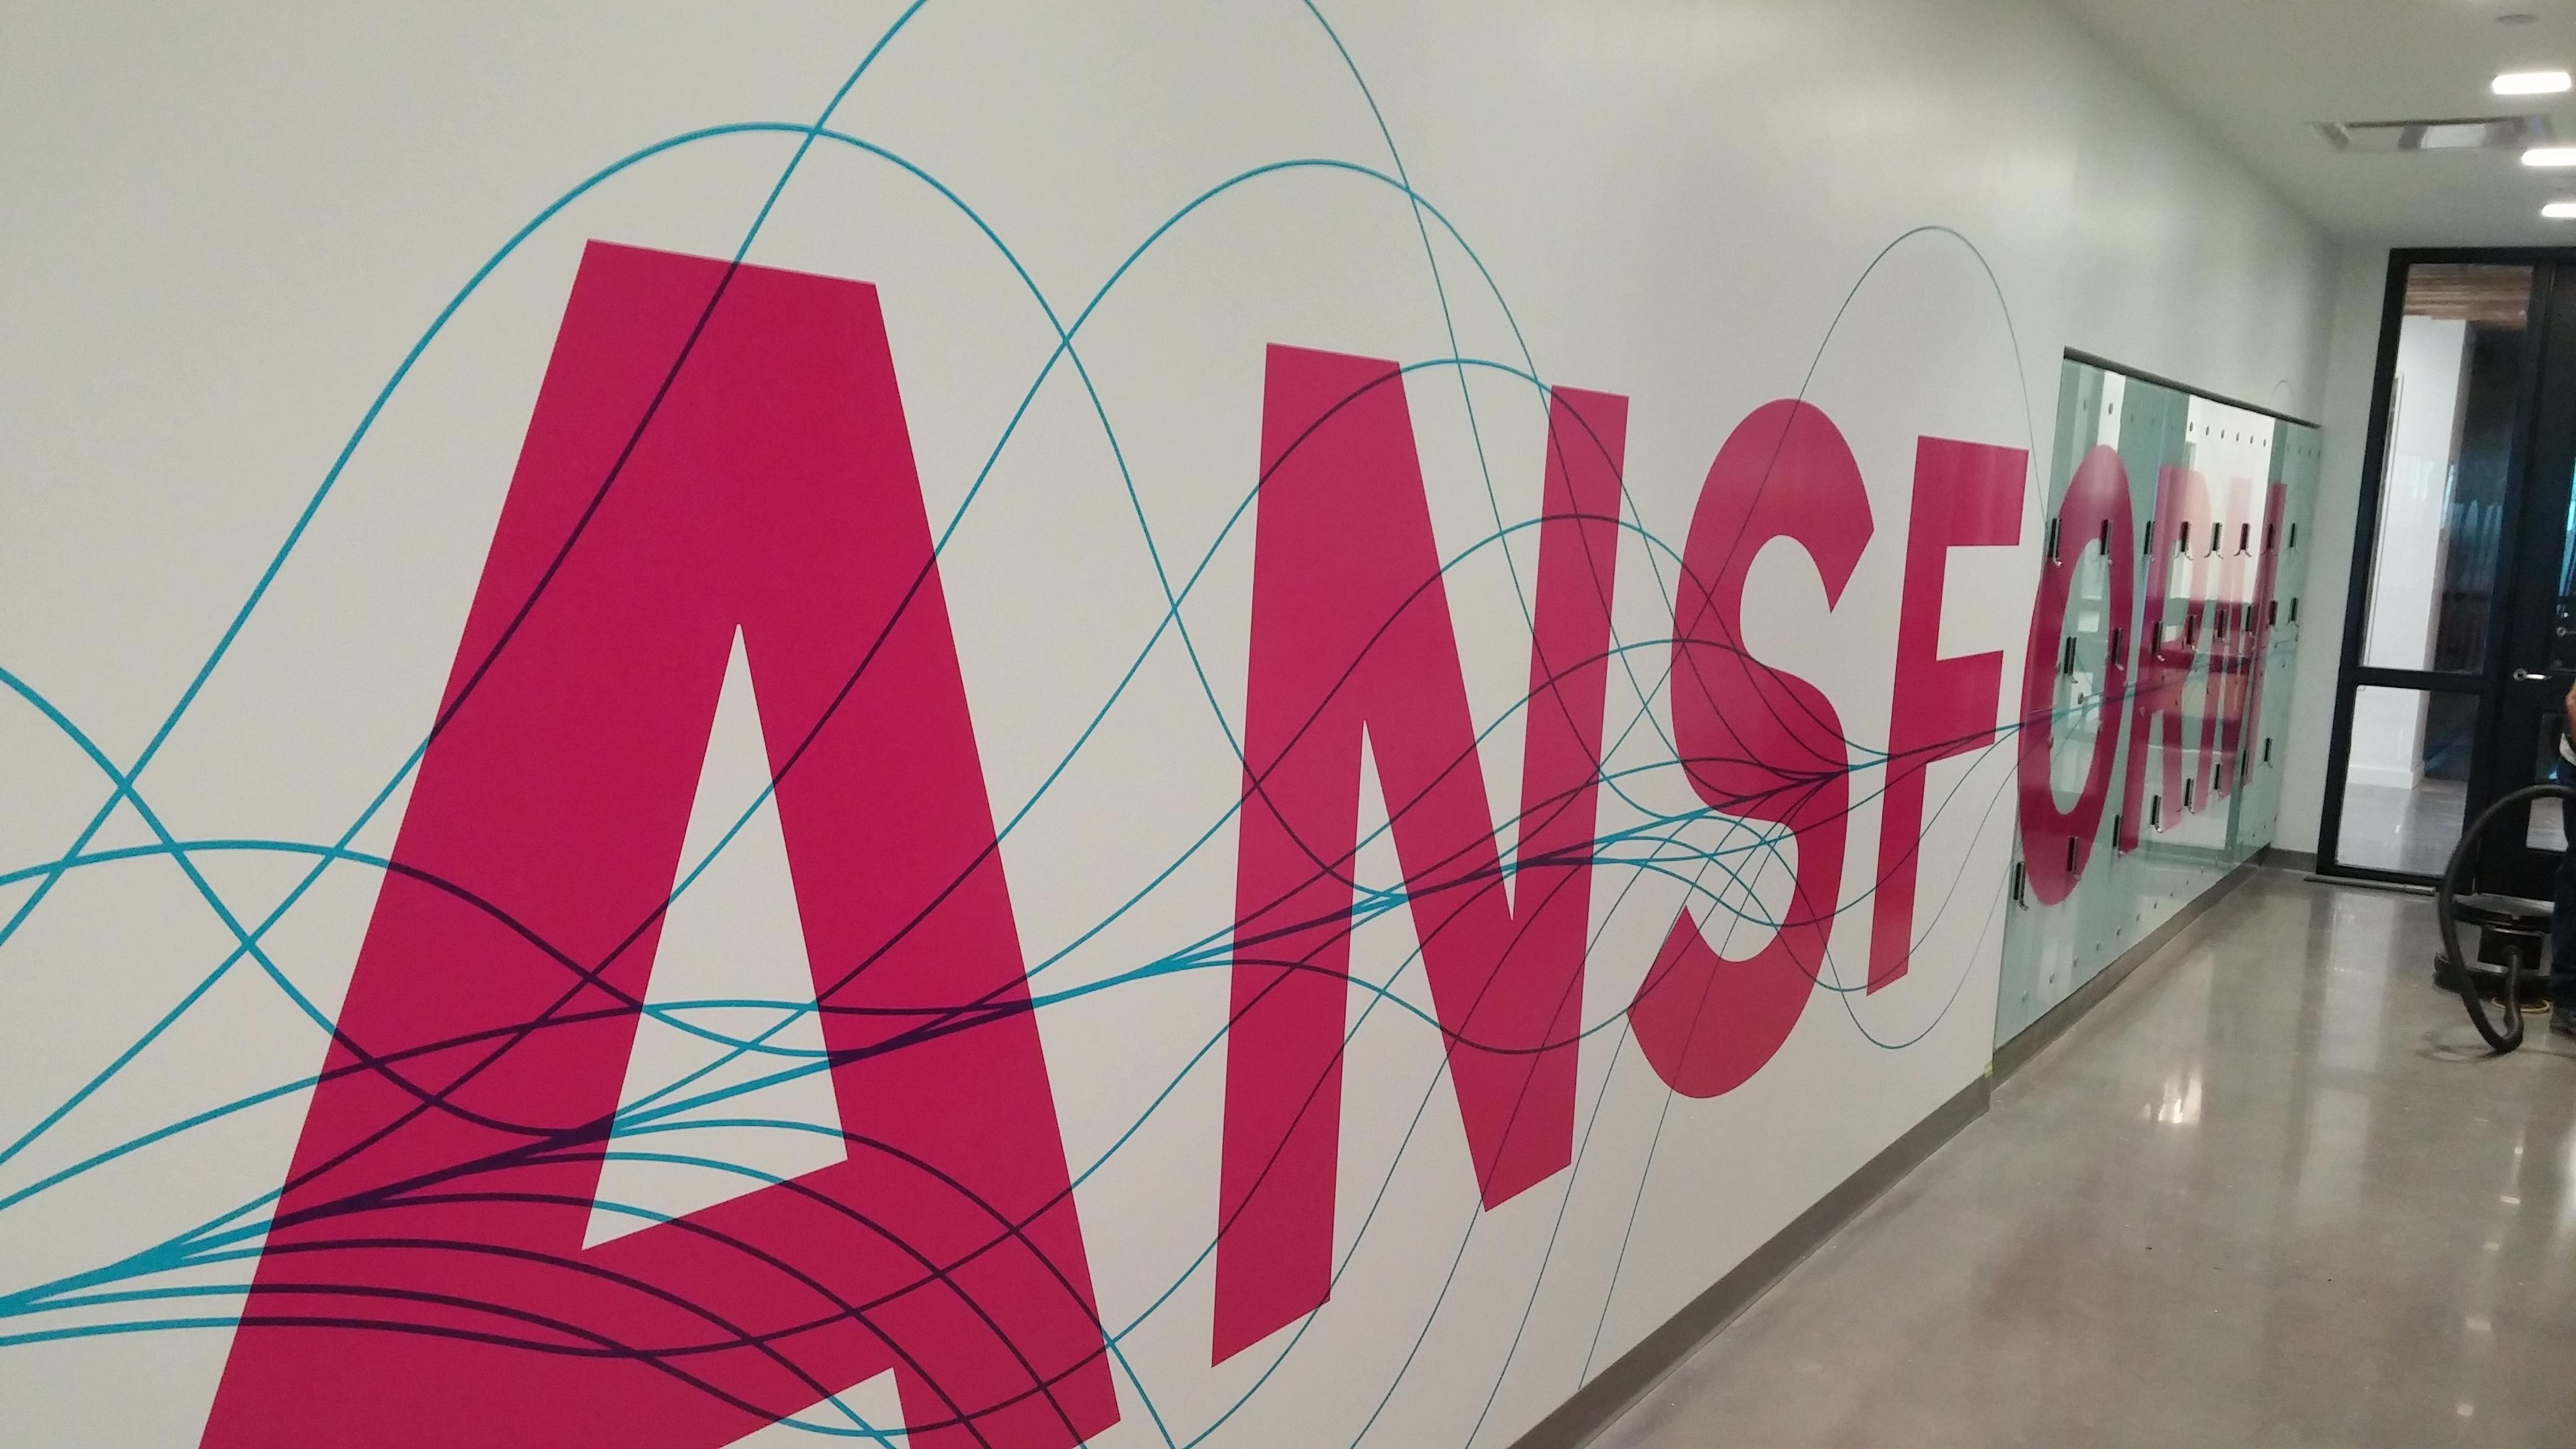 Wall graphic branding